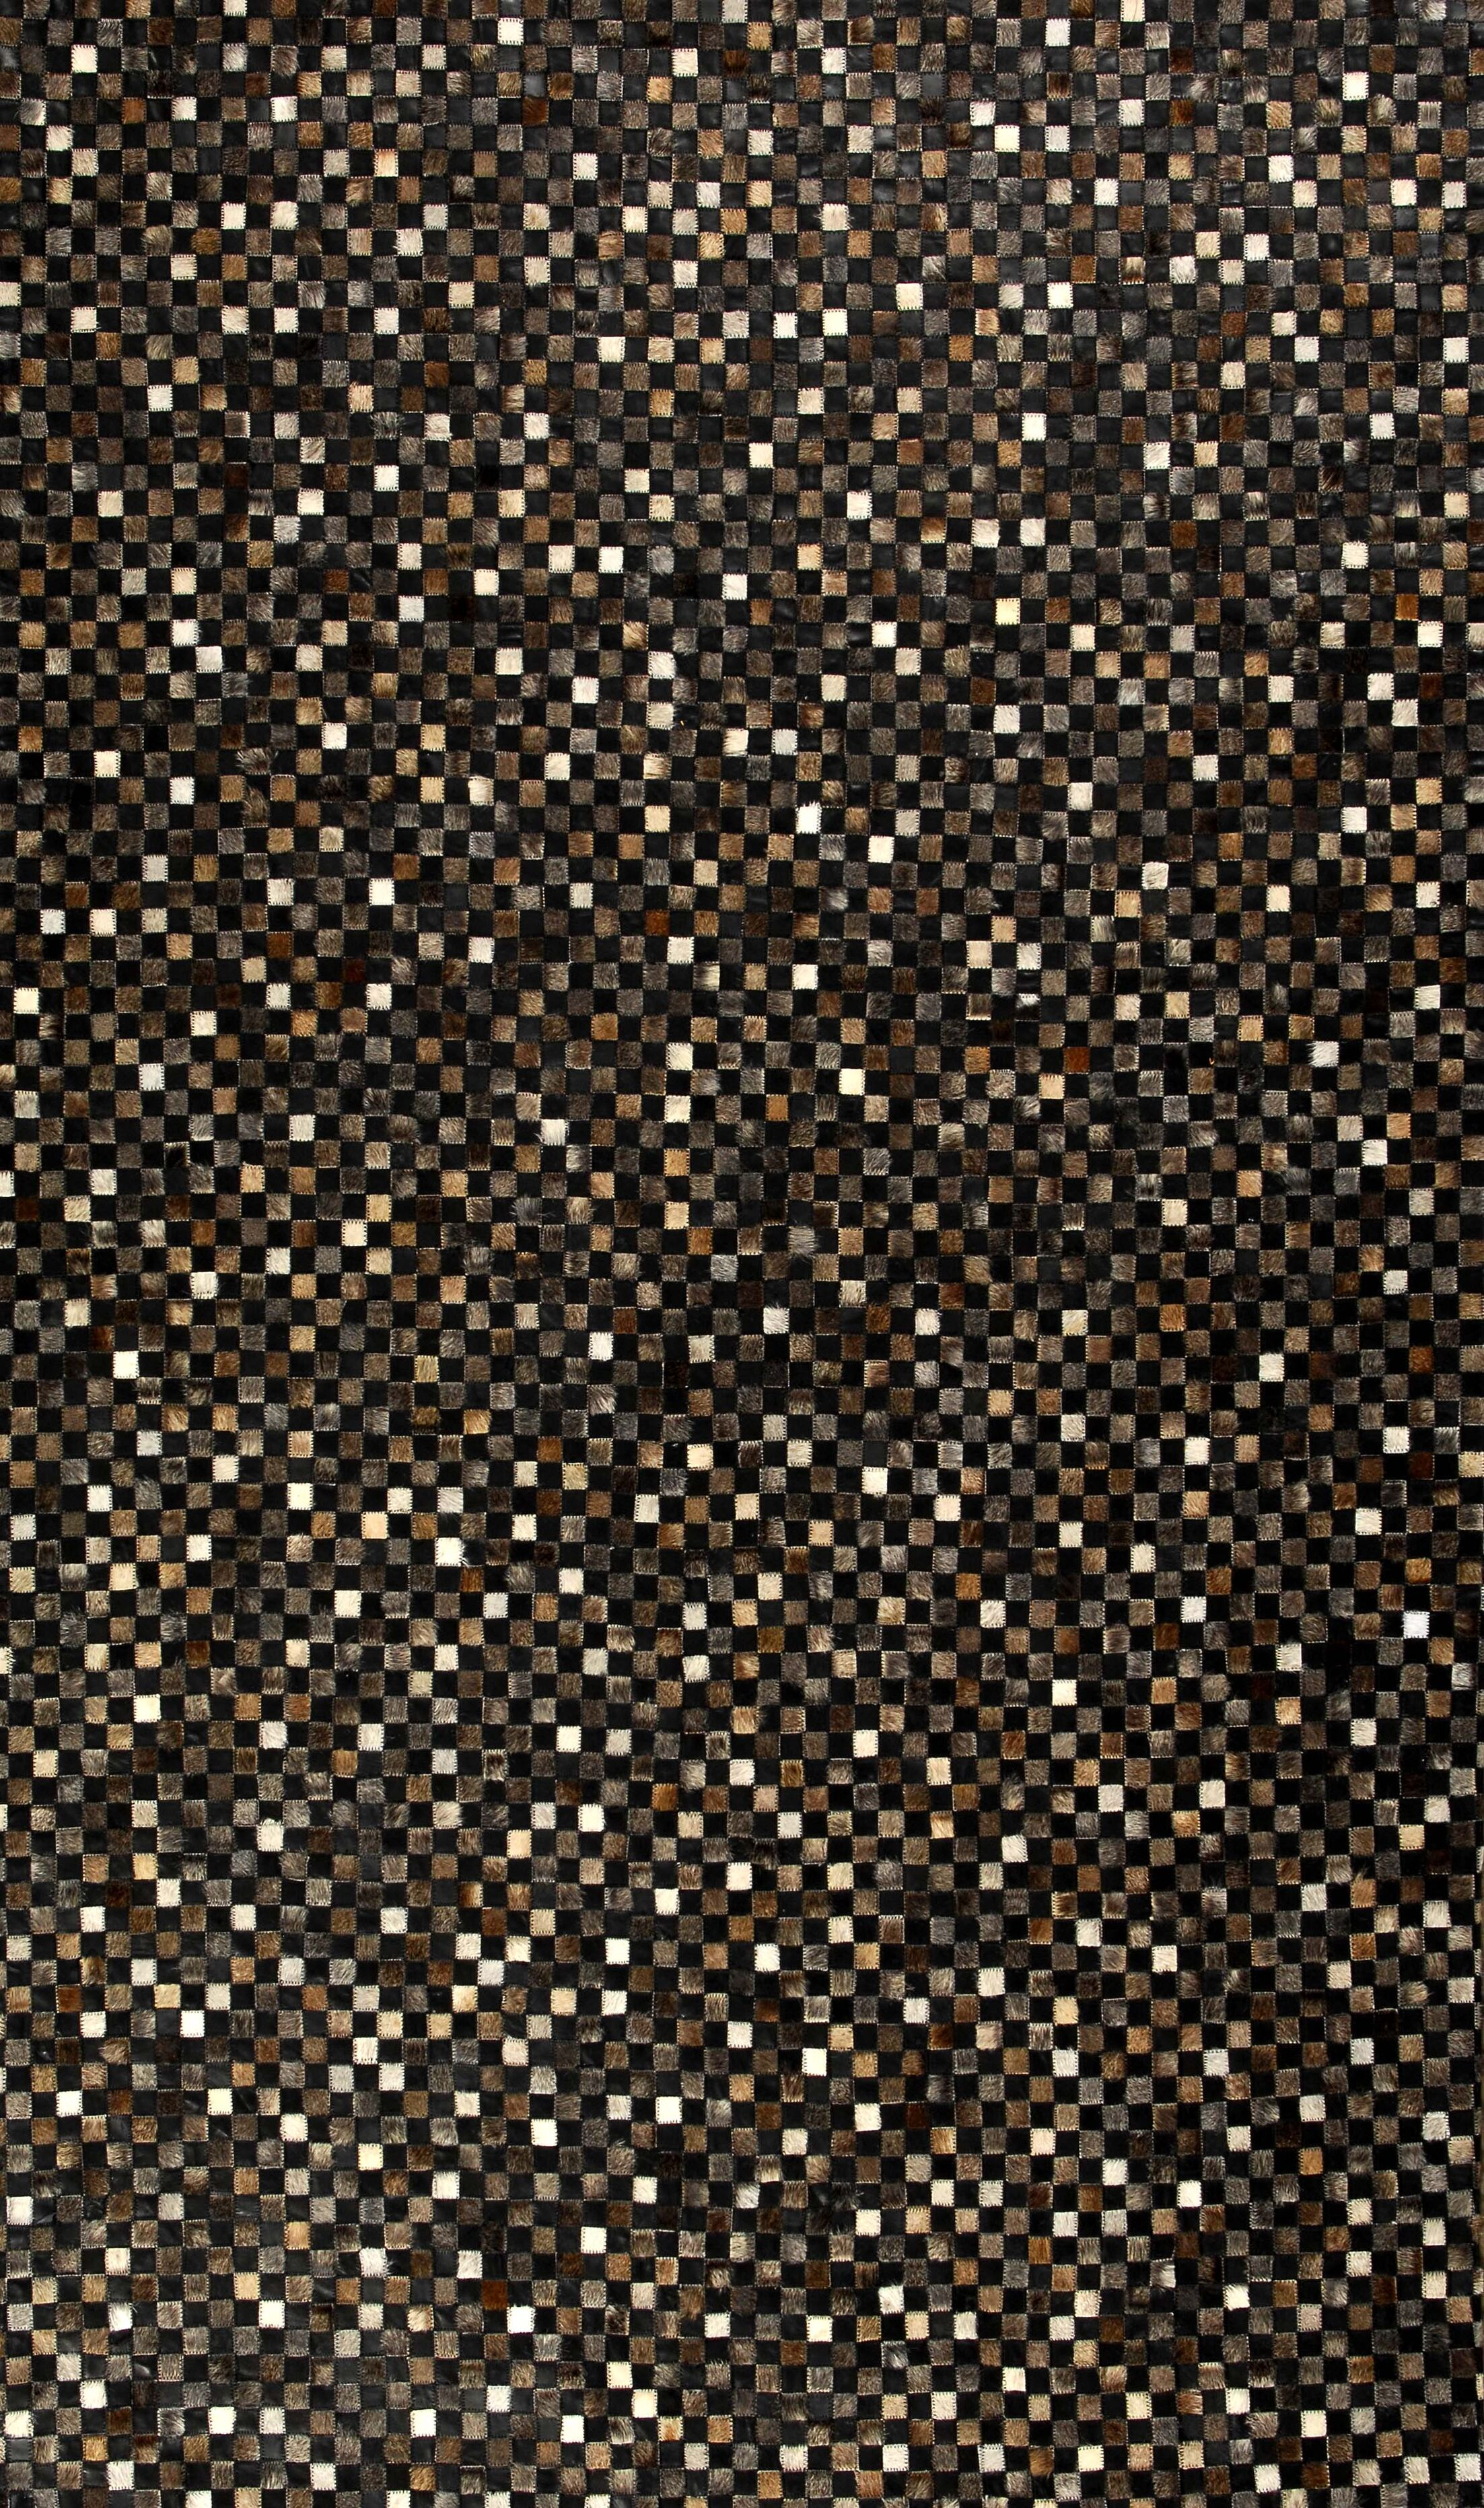 Ilfracombe Black Geometric Area Rug Rug Size: 8' x 11'